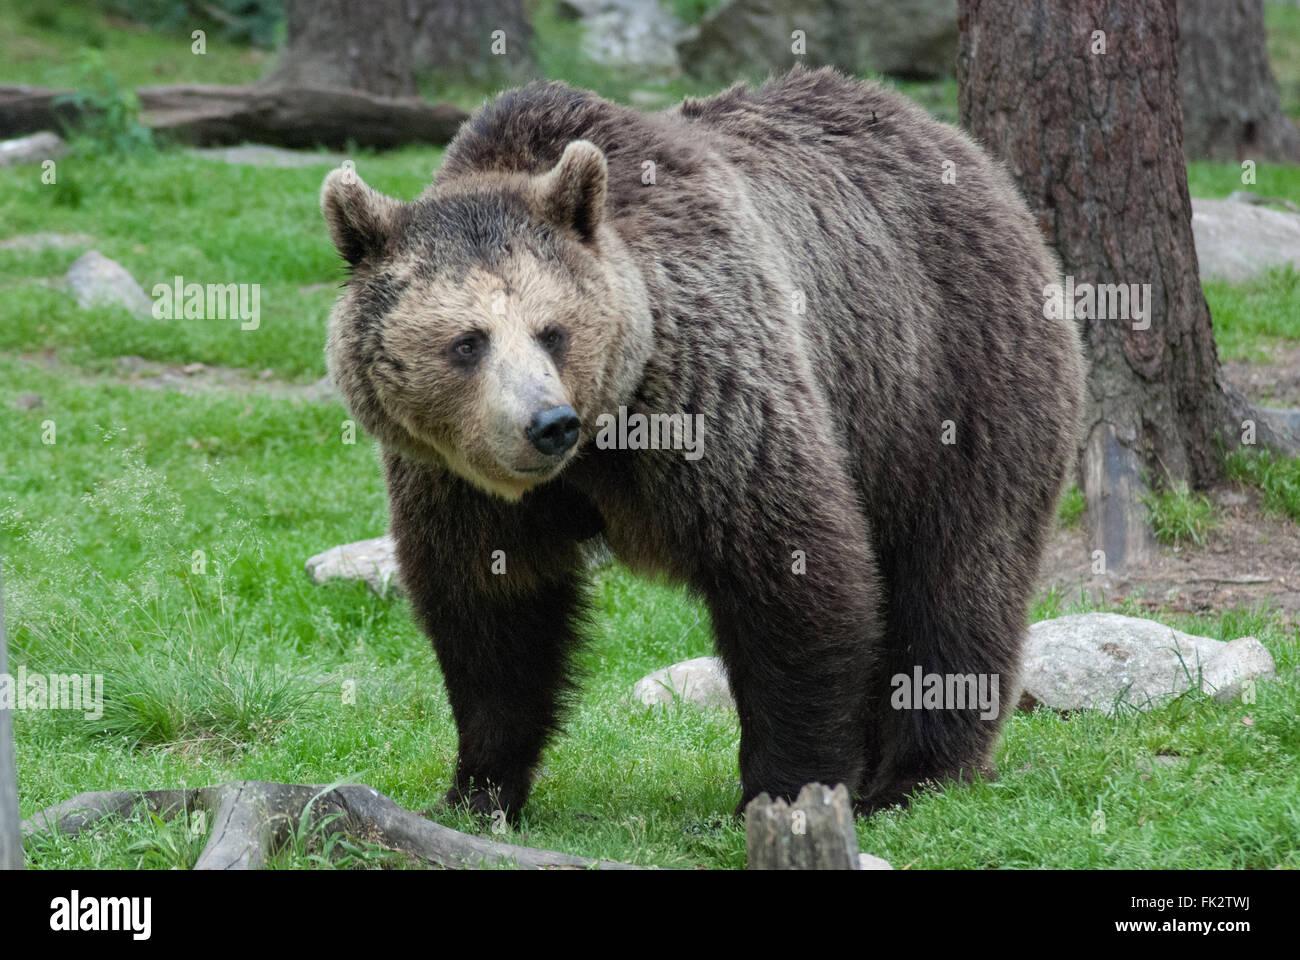 European brown bear or Eurasian brown bear (Ursus arctos arctos) in Taiga forest in eastern Finland. Stock Photo